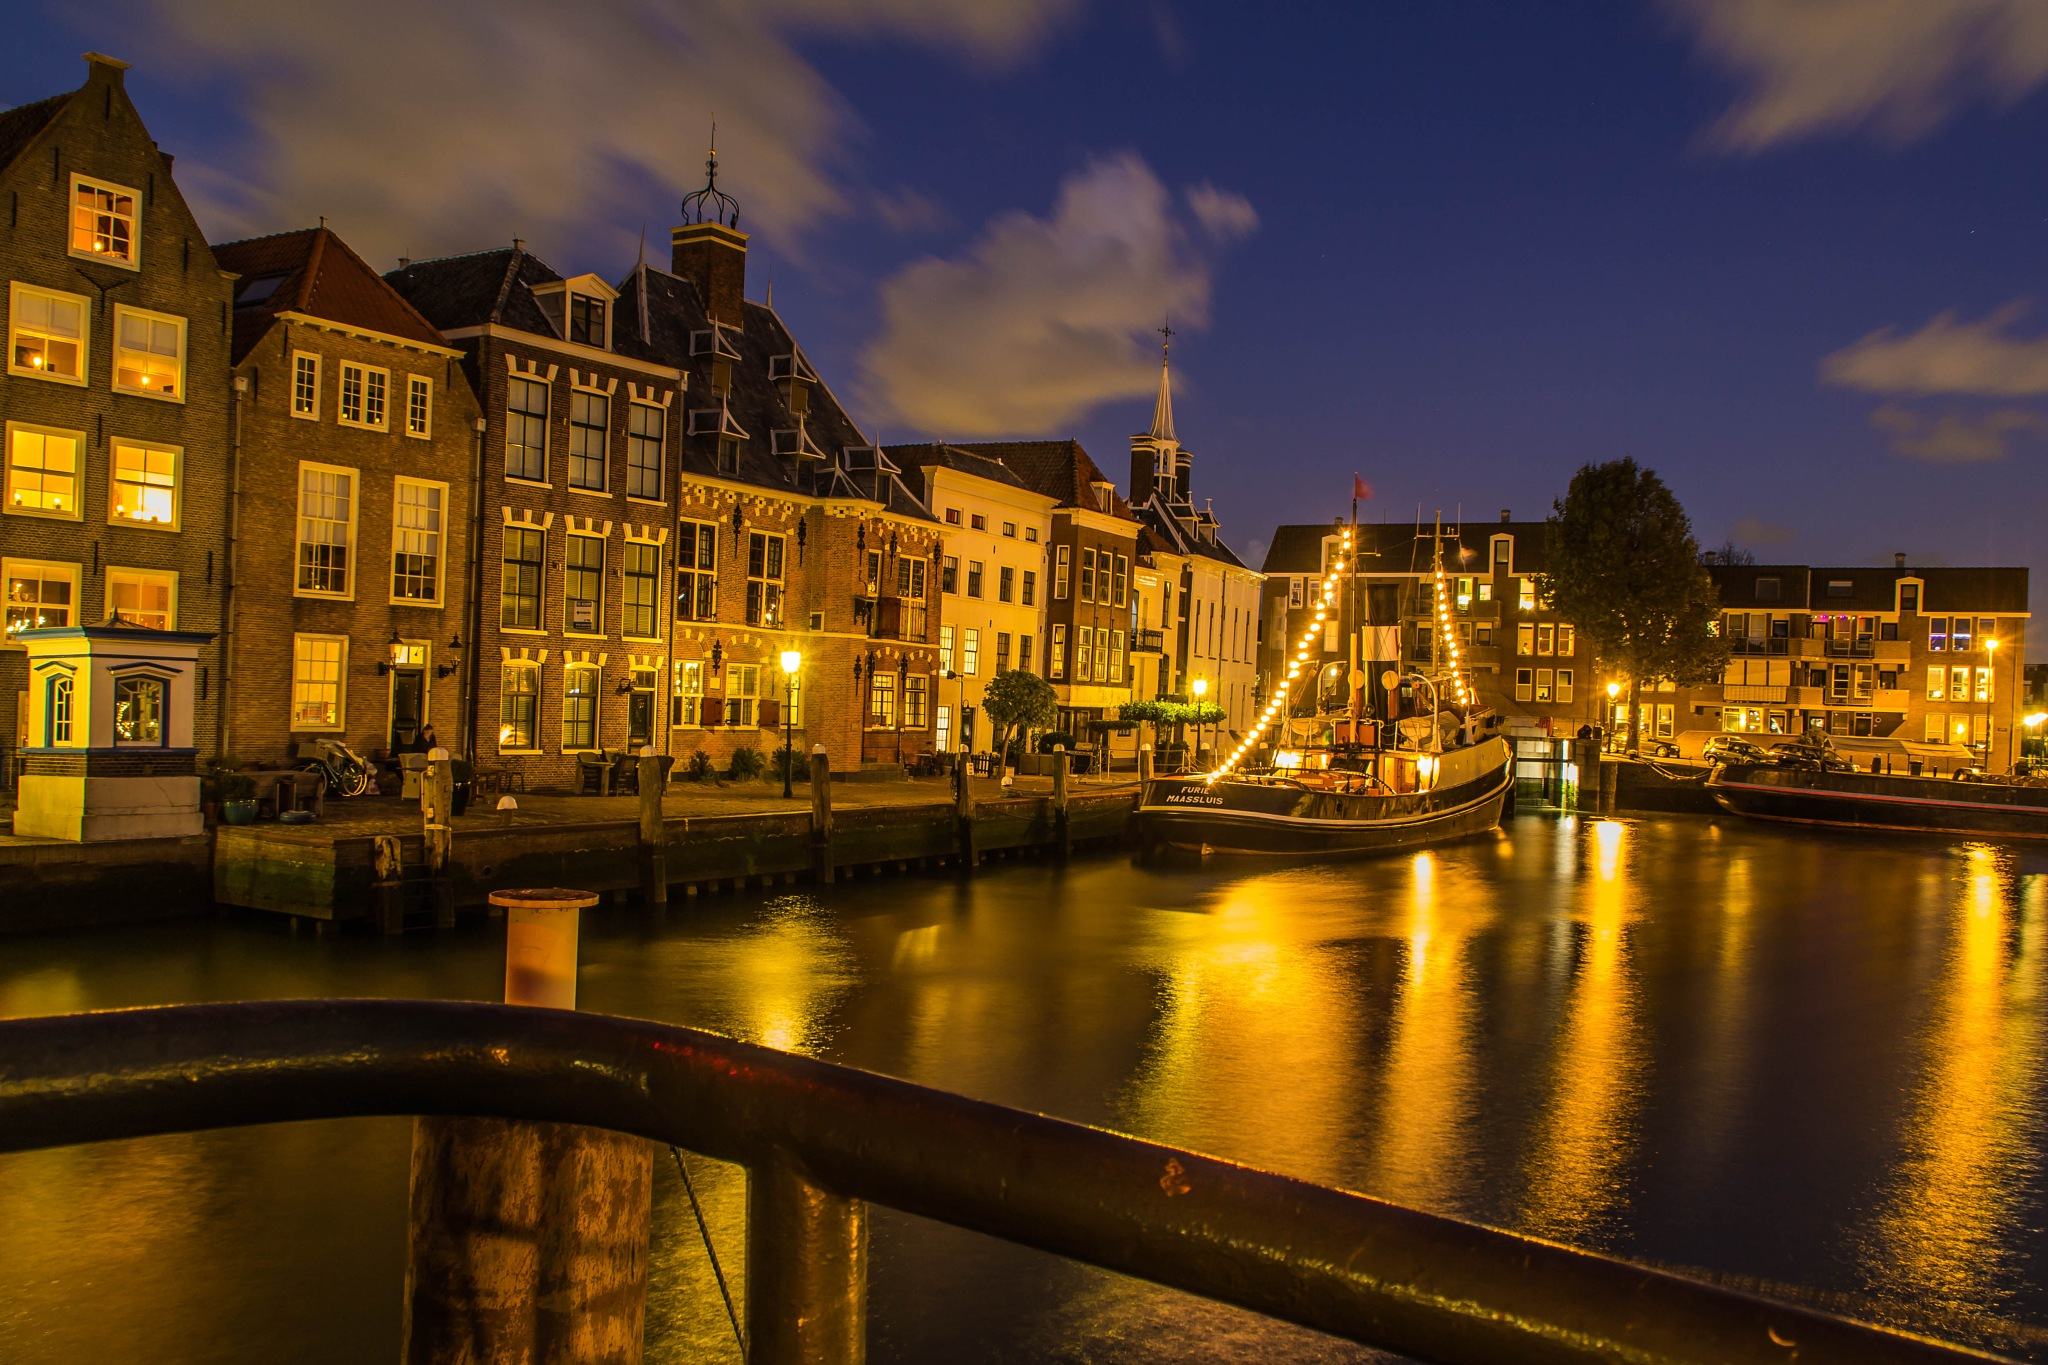 Harbour by Gerrit Kuyvenhoven